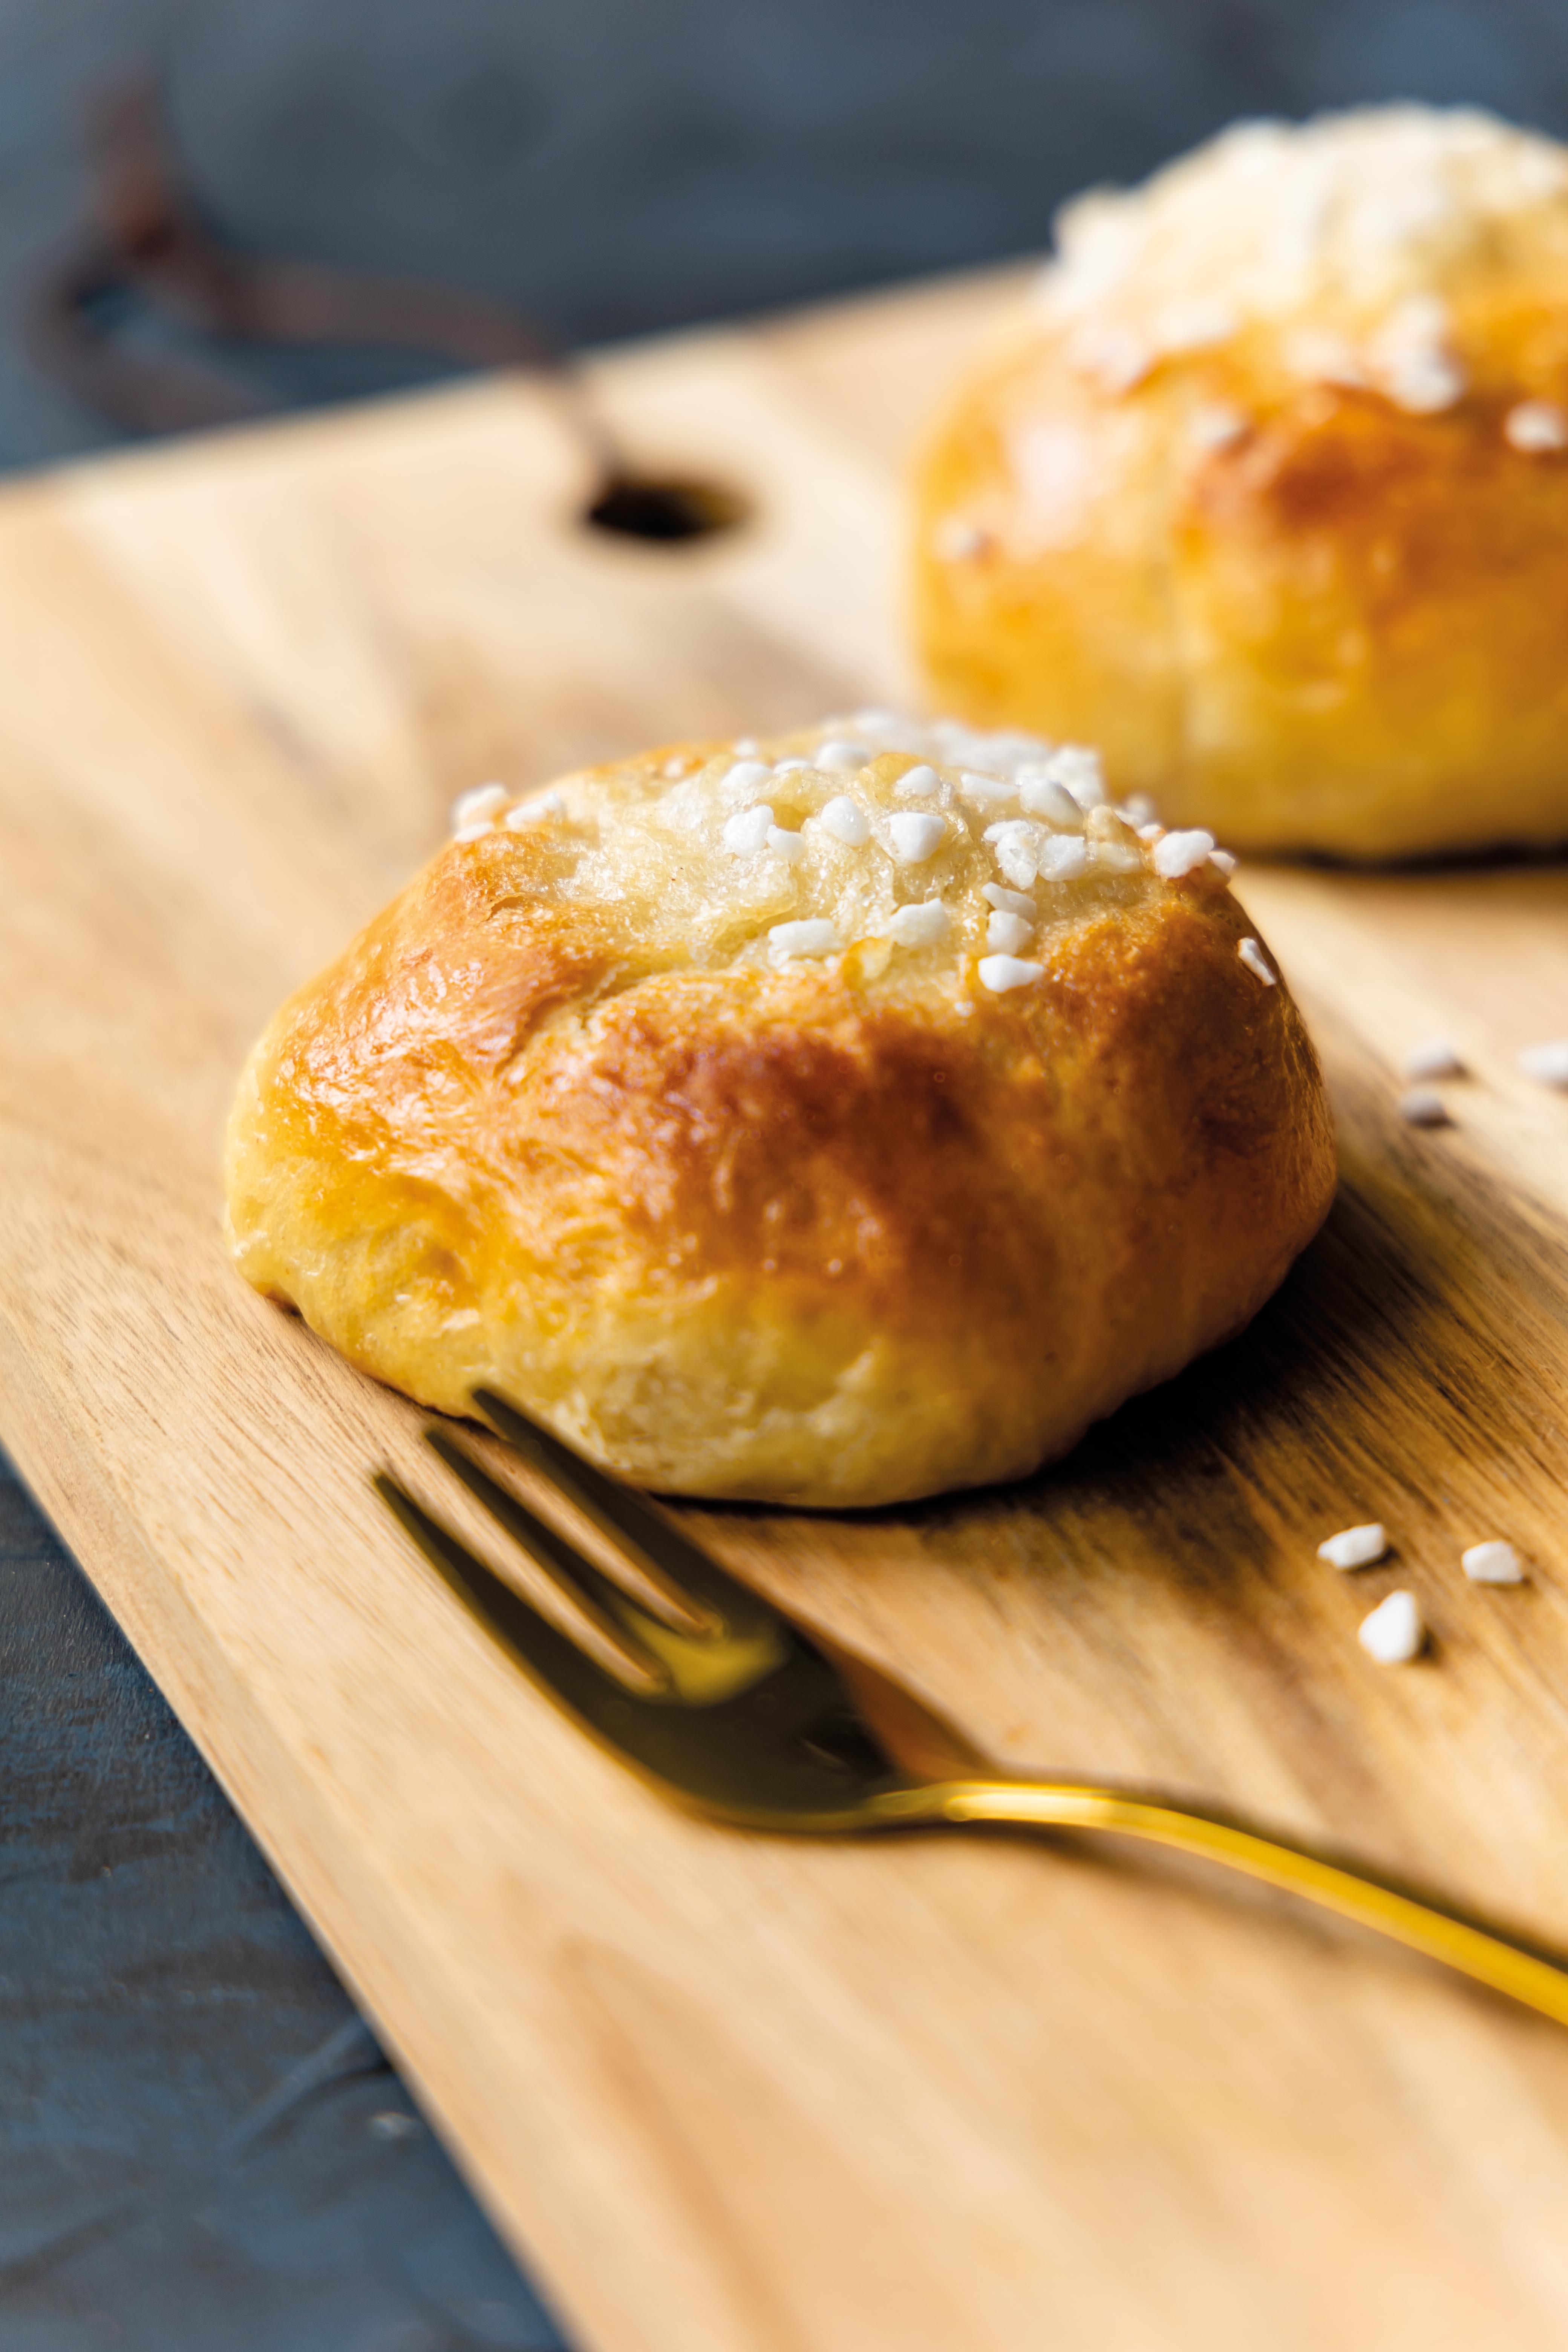 Voisilmäpulla – finnische Kardamom Butterküchlein // Voisimäpulla –  Finnish cardamom spiced sweet Buns by https://babyrockmyday.com/voisilmaepulla-finnische-kardamom-butterkuechlein/